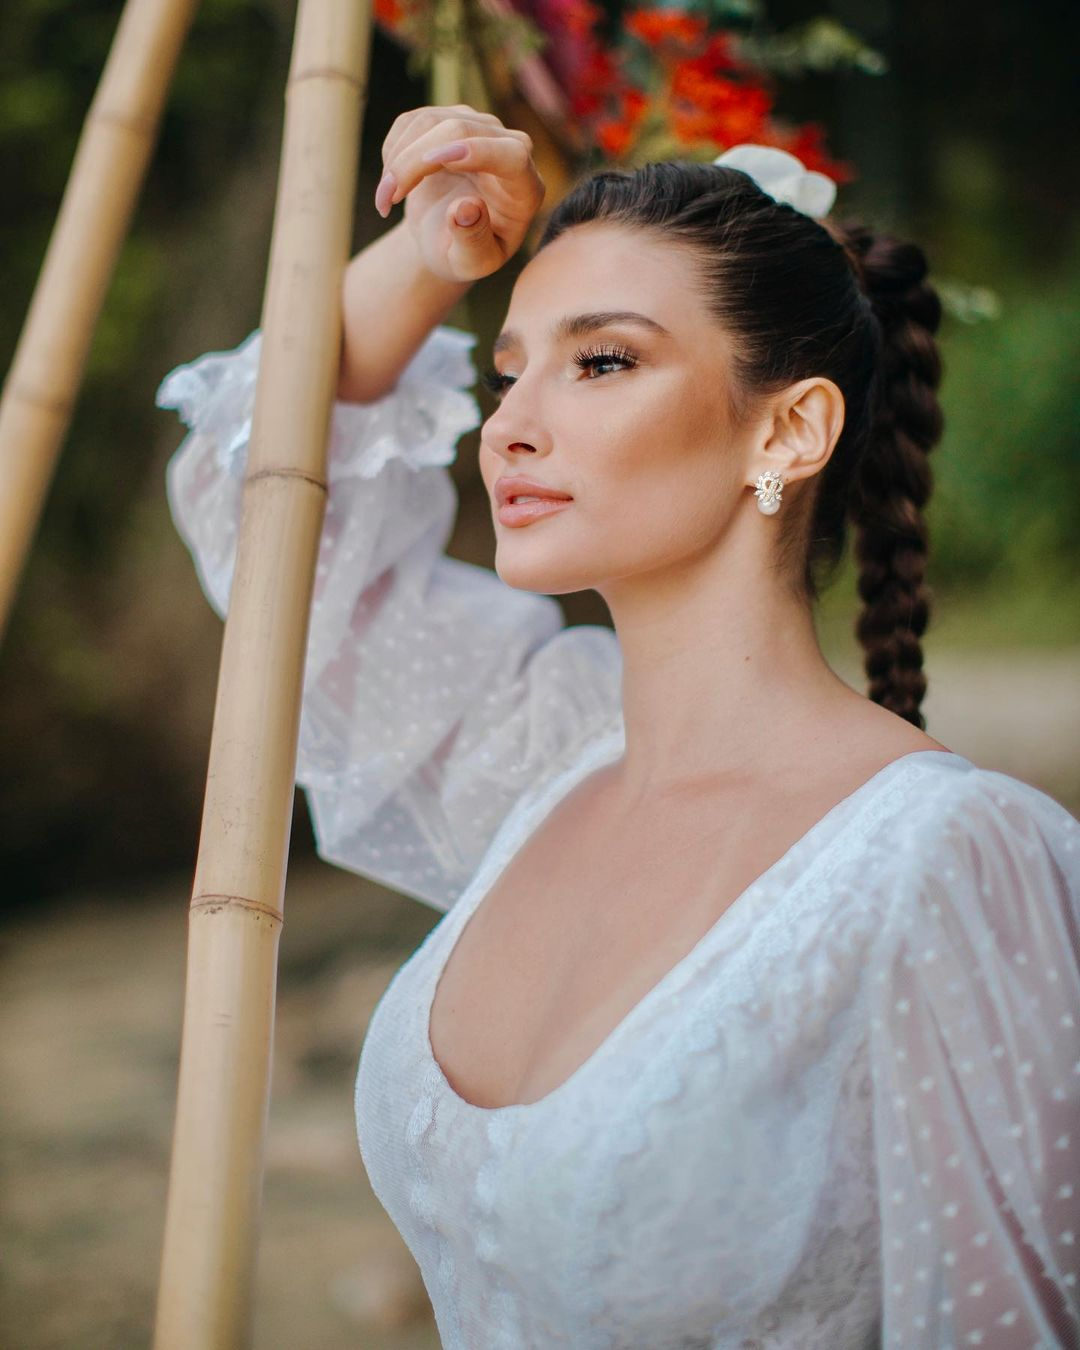 luma russo, top 3 de miss supranational brazil 2020. - Página 3 Russol19